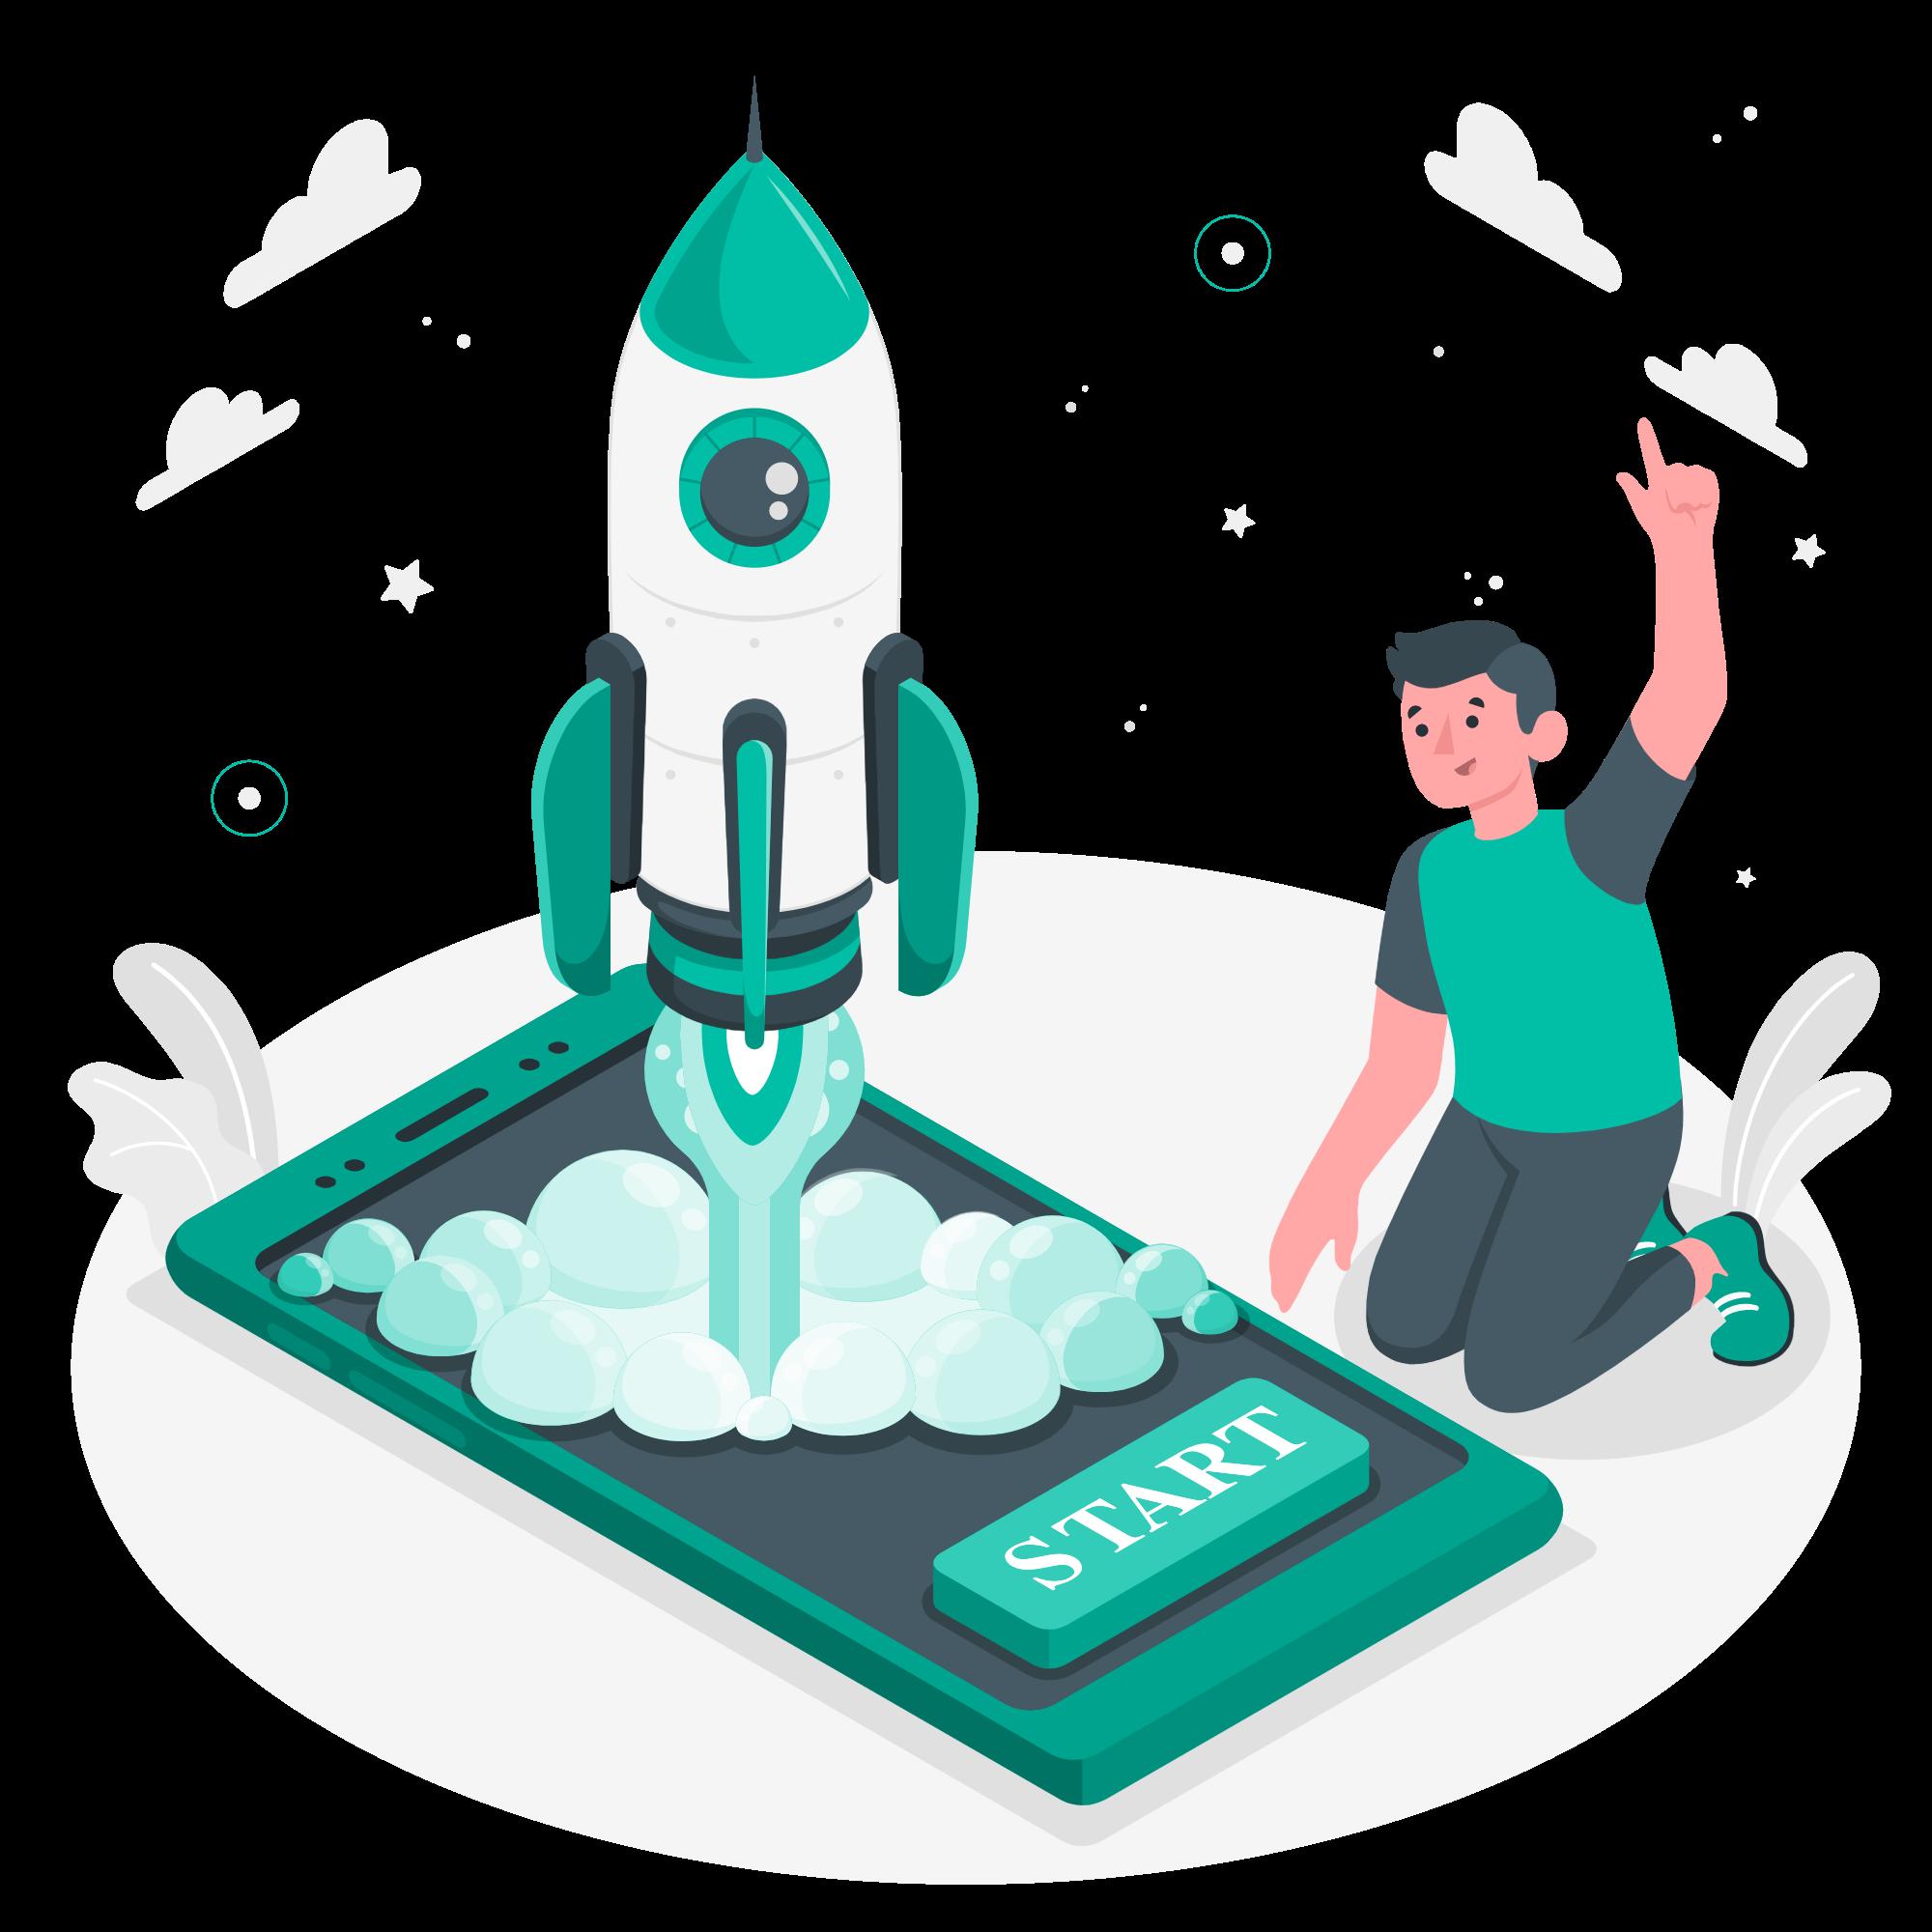 Recherche emploi startup